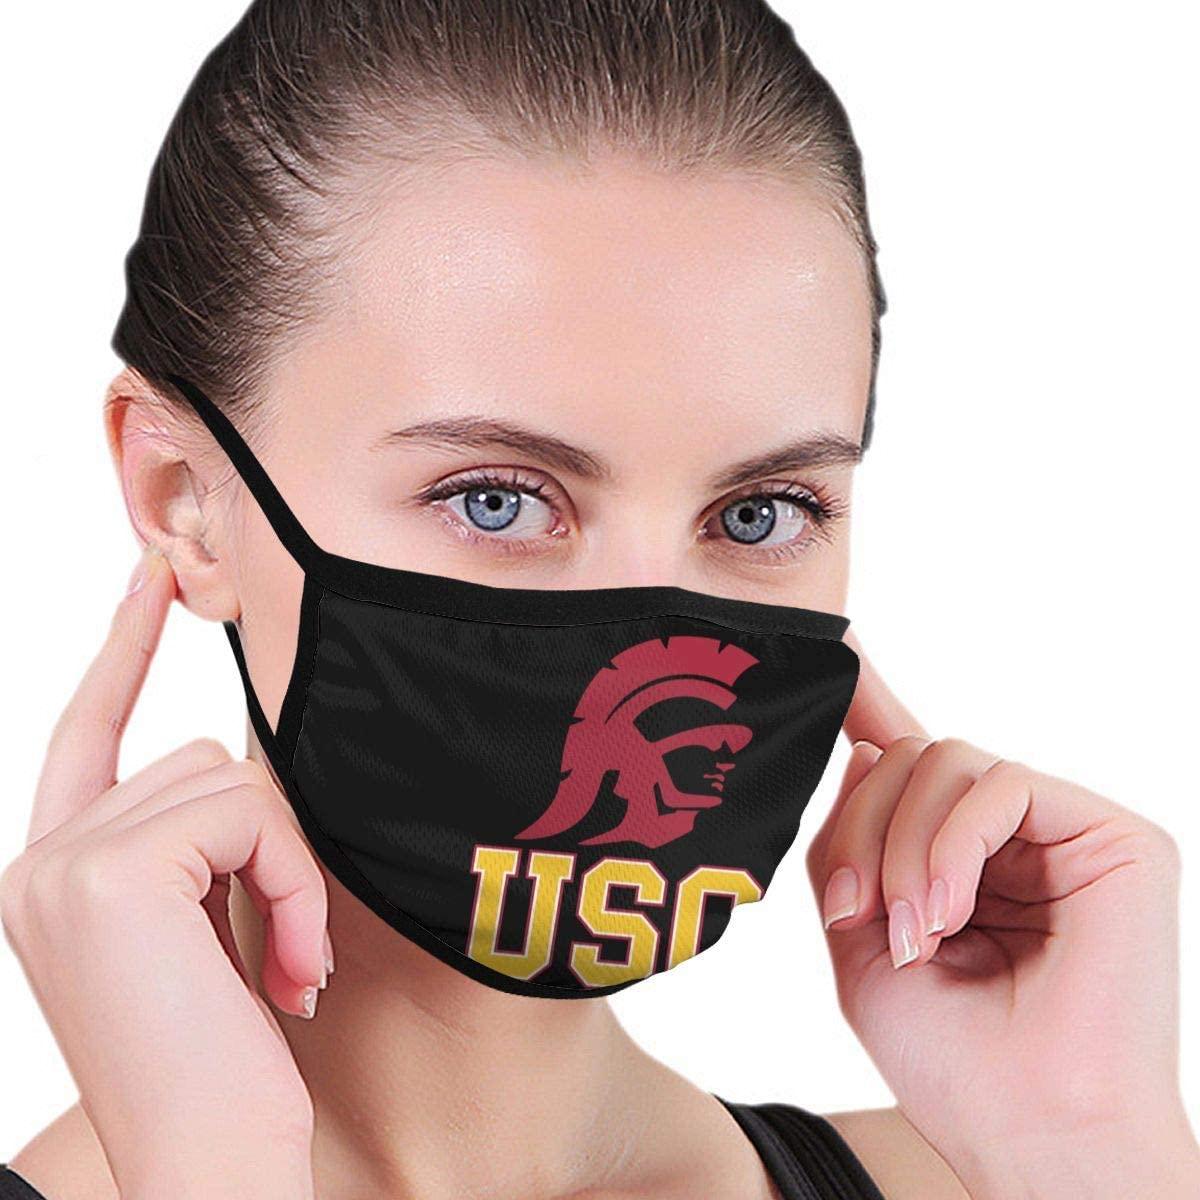 Usc Commemorate Outdoor Decorative Face Protection Face Cover Bandana Gaiter Balaclava Scarf Headwear